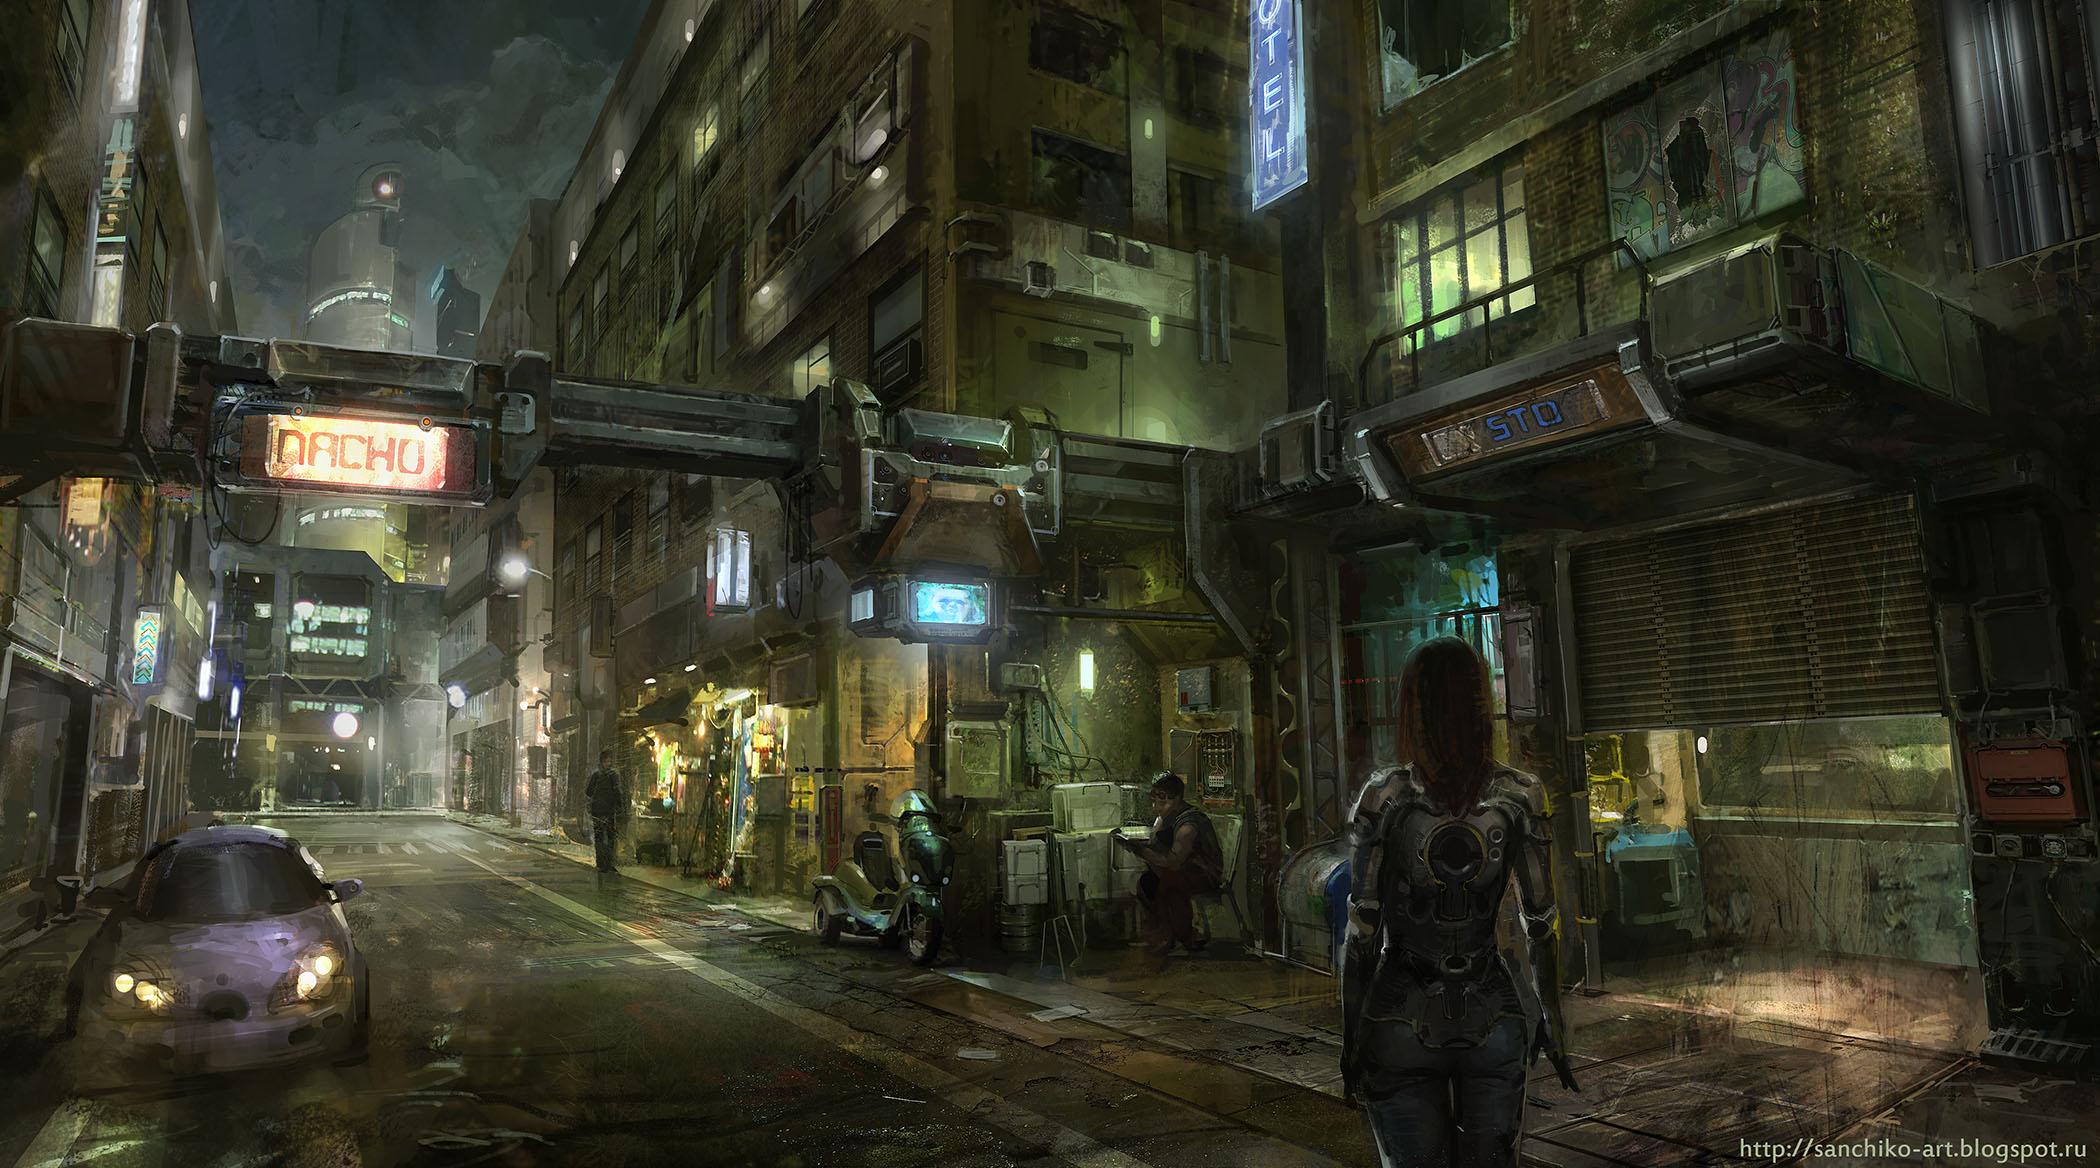 Streets by Sanchiko